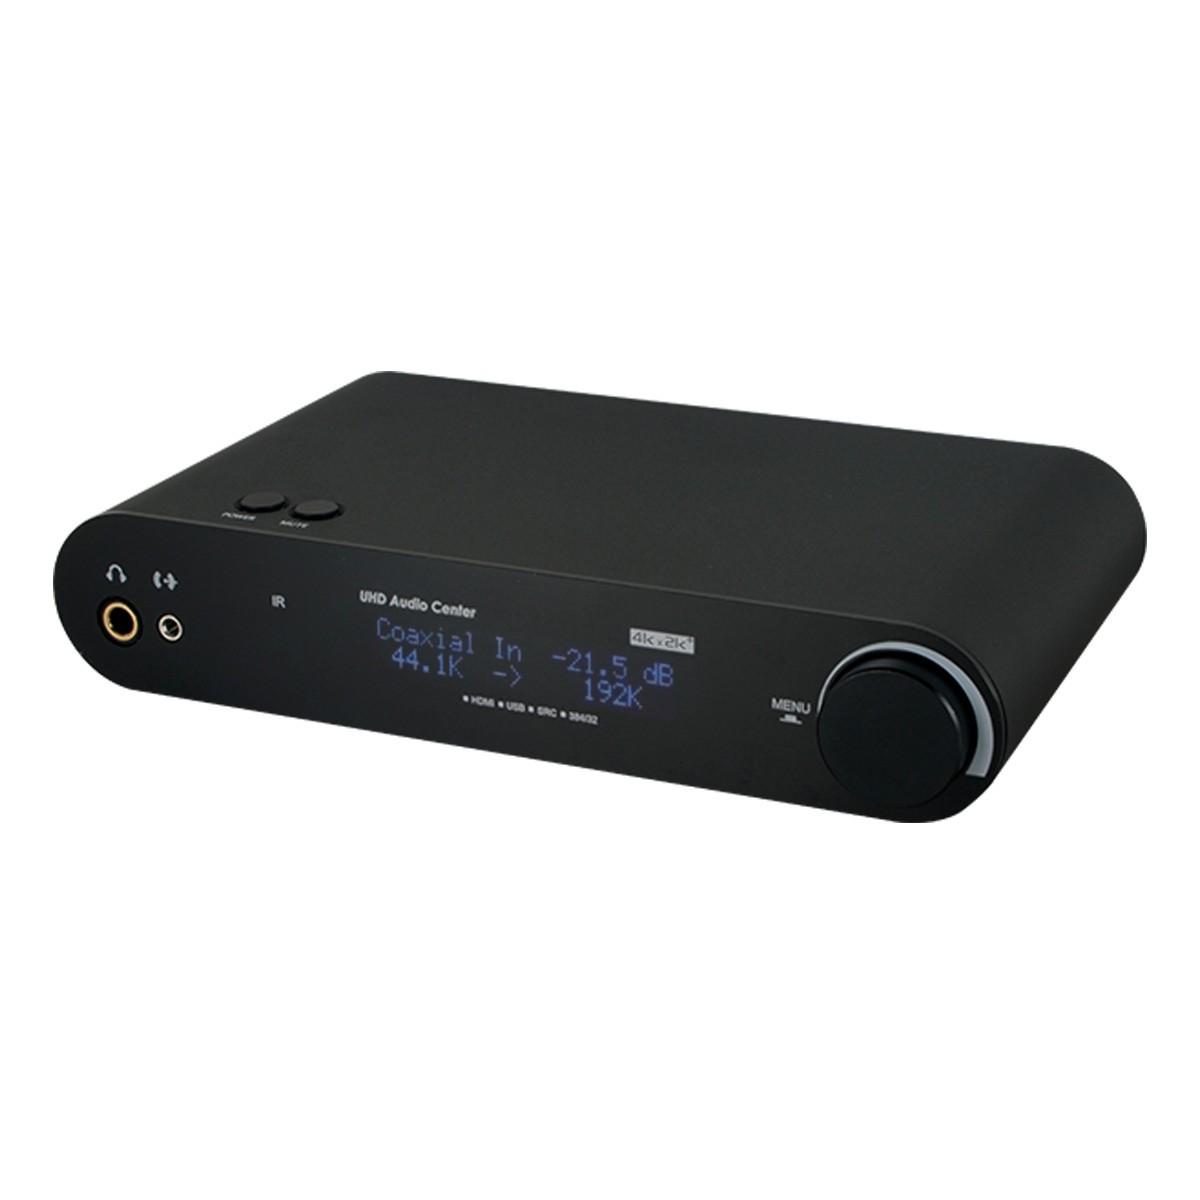 CYP DCT-37 HDMI DAC / Preamplifier / Headphone Amplifier HDMI SPDIF USB RCA 32bit / 384khz